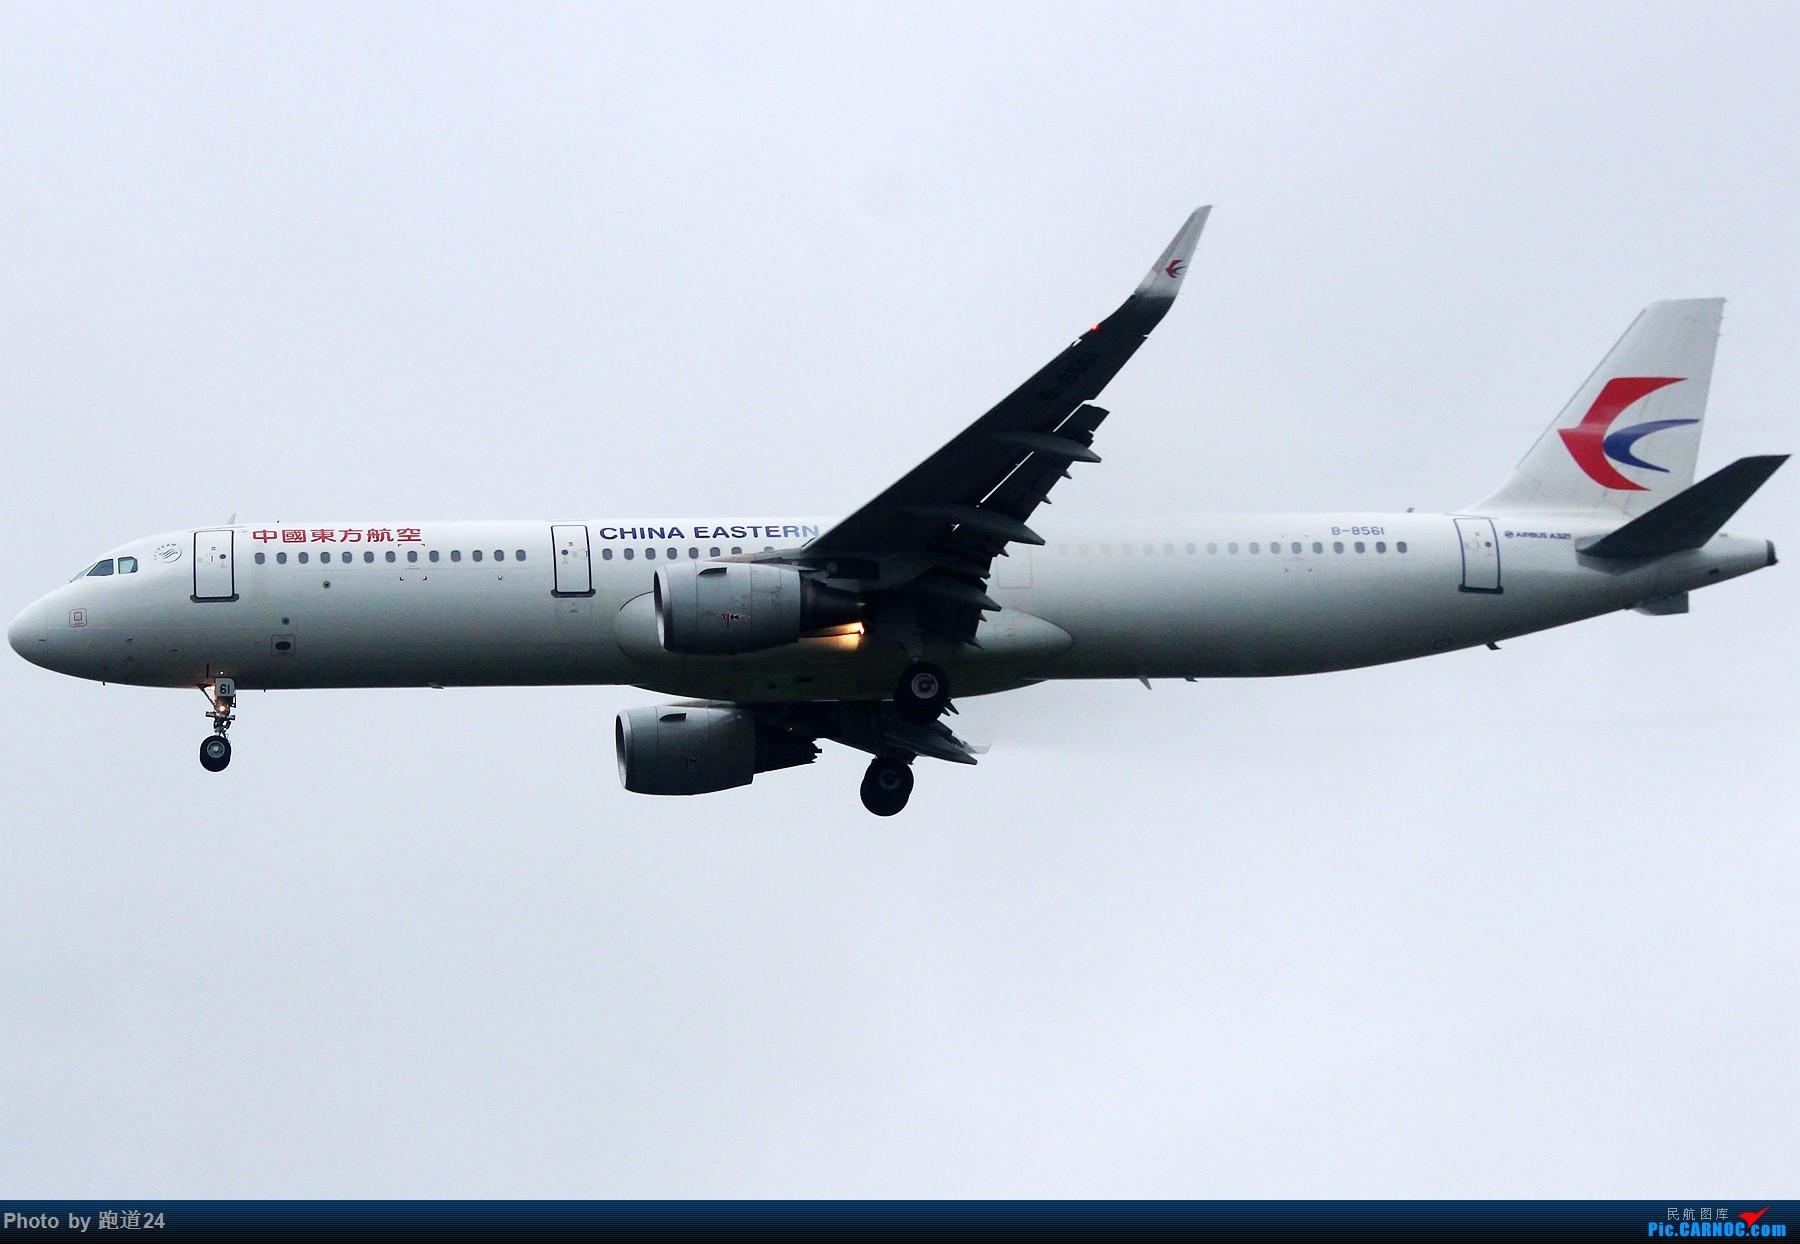 Re:[多图党]雨天CTU拍机 1800*1200 AIRBUS A321-200 B-8561 中国成都双流国际机场